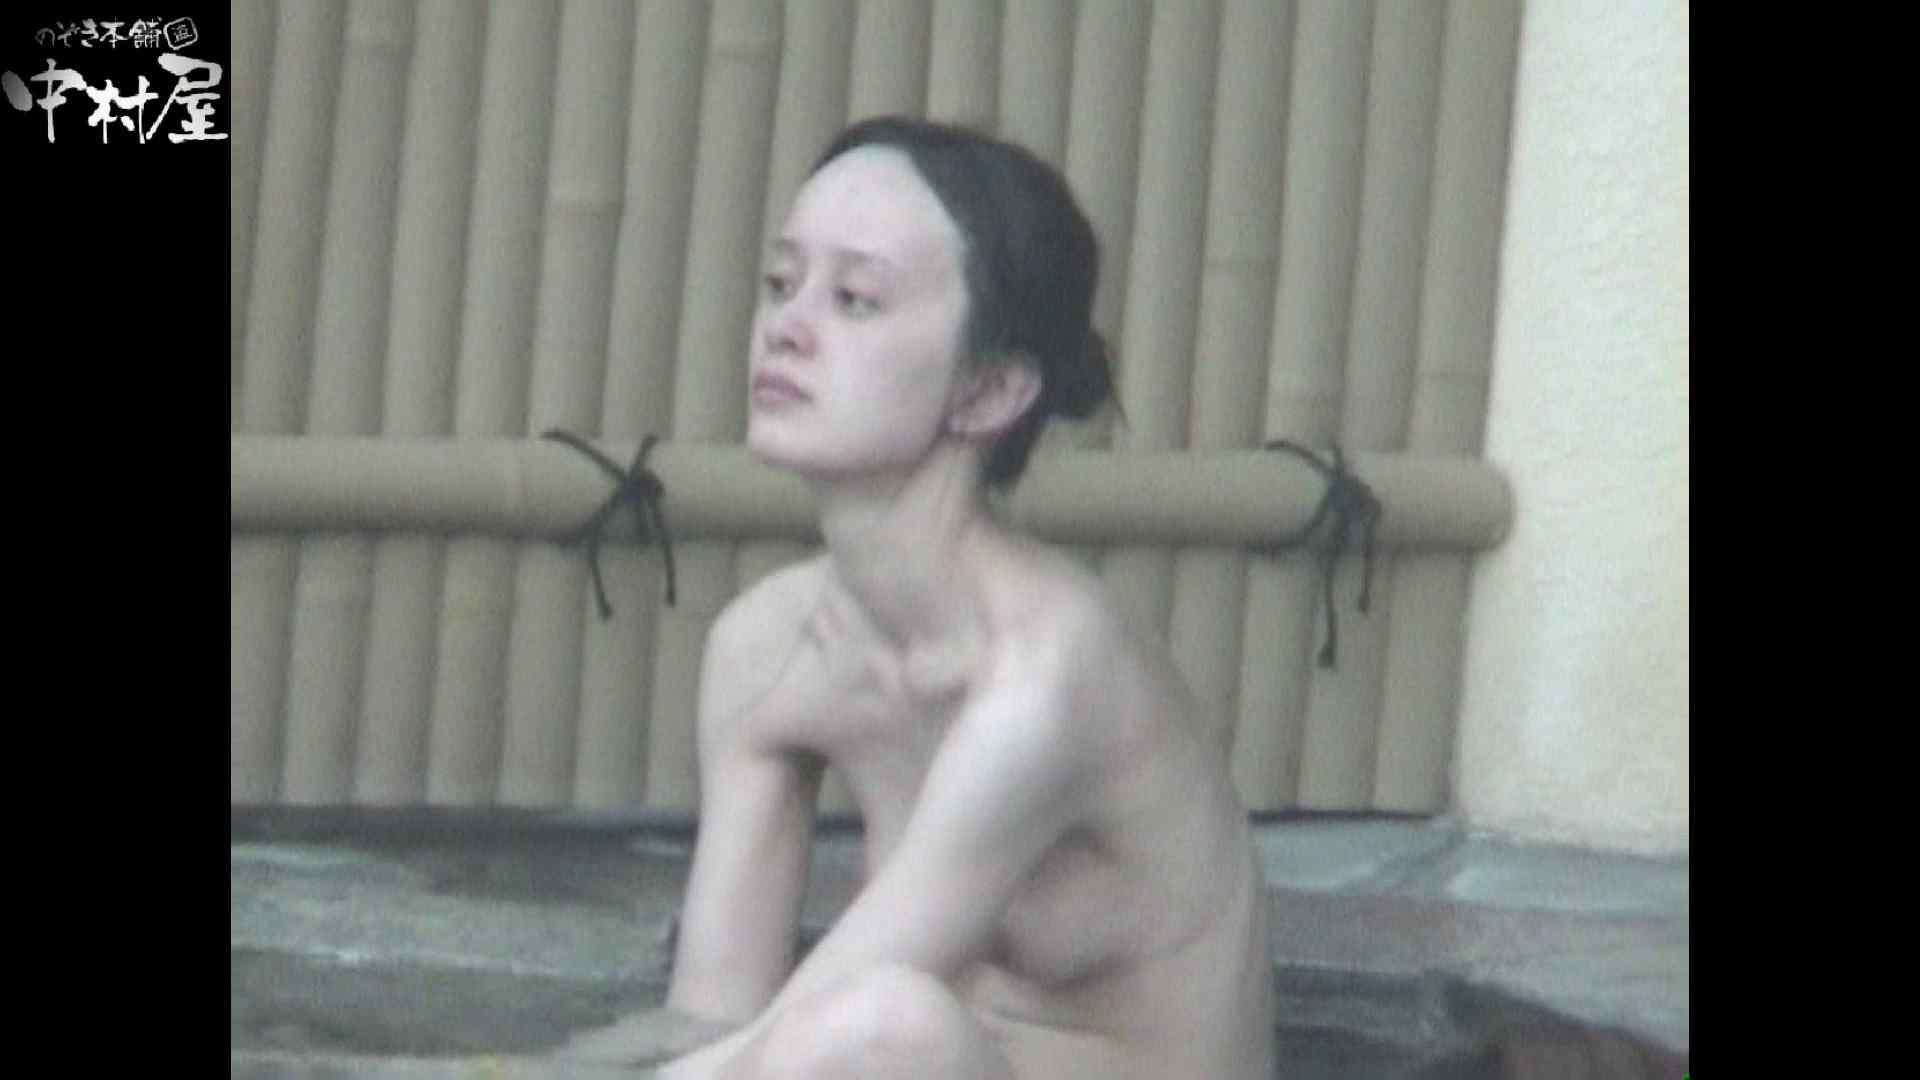 Aquaな露天風呂Vol.973 美しいOLの裸体 性交動画流出 95pic 47